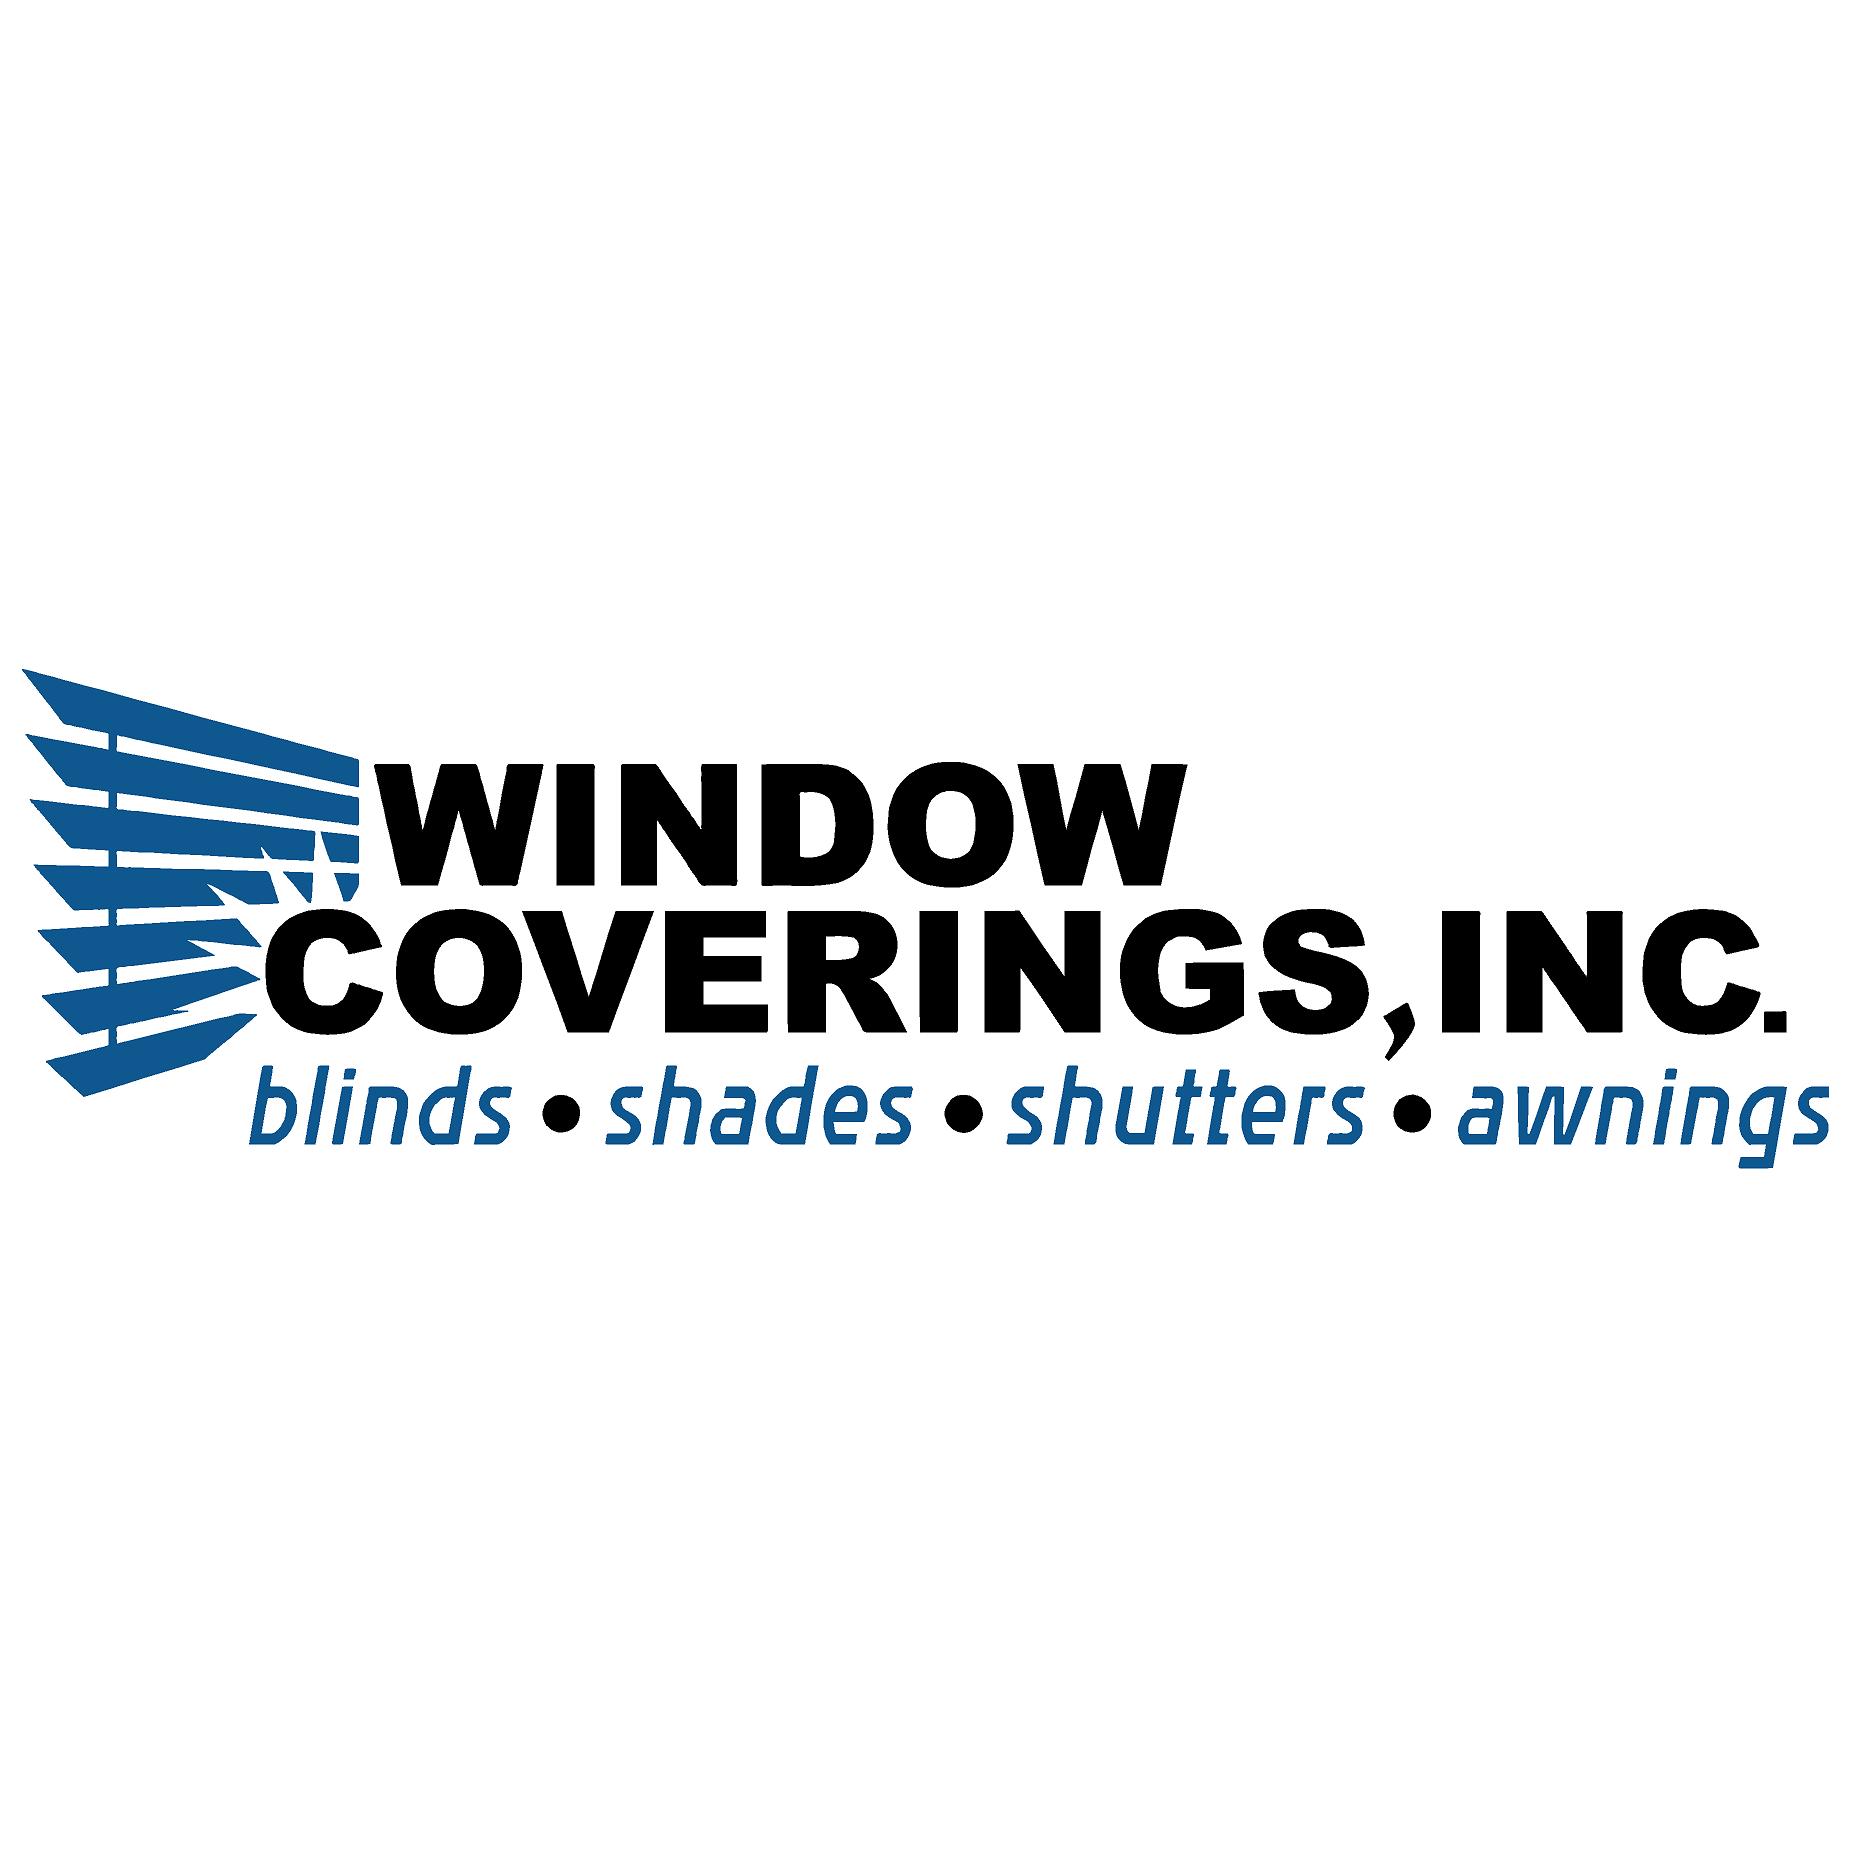 Window Coverings, Inc.